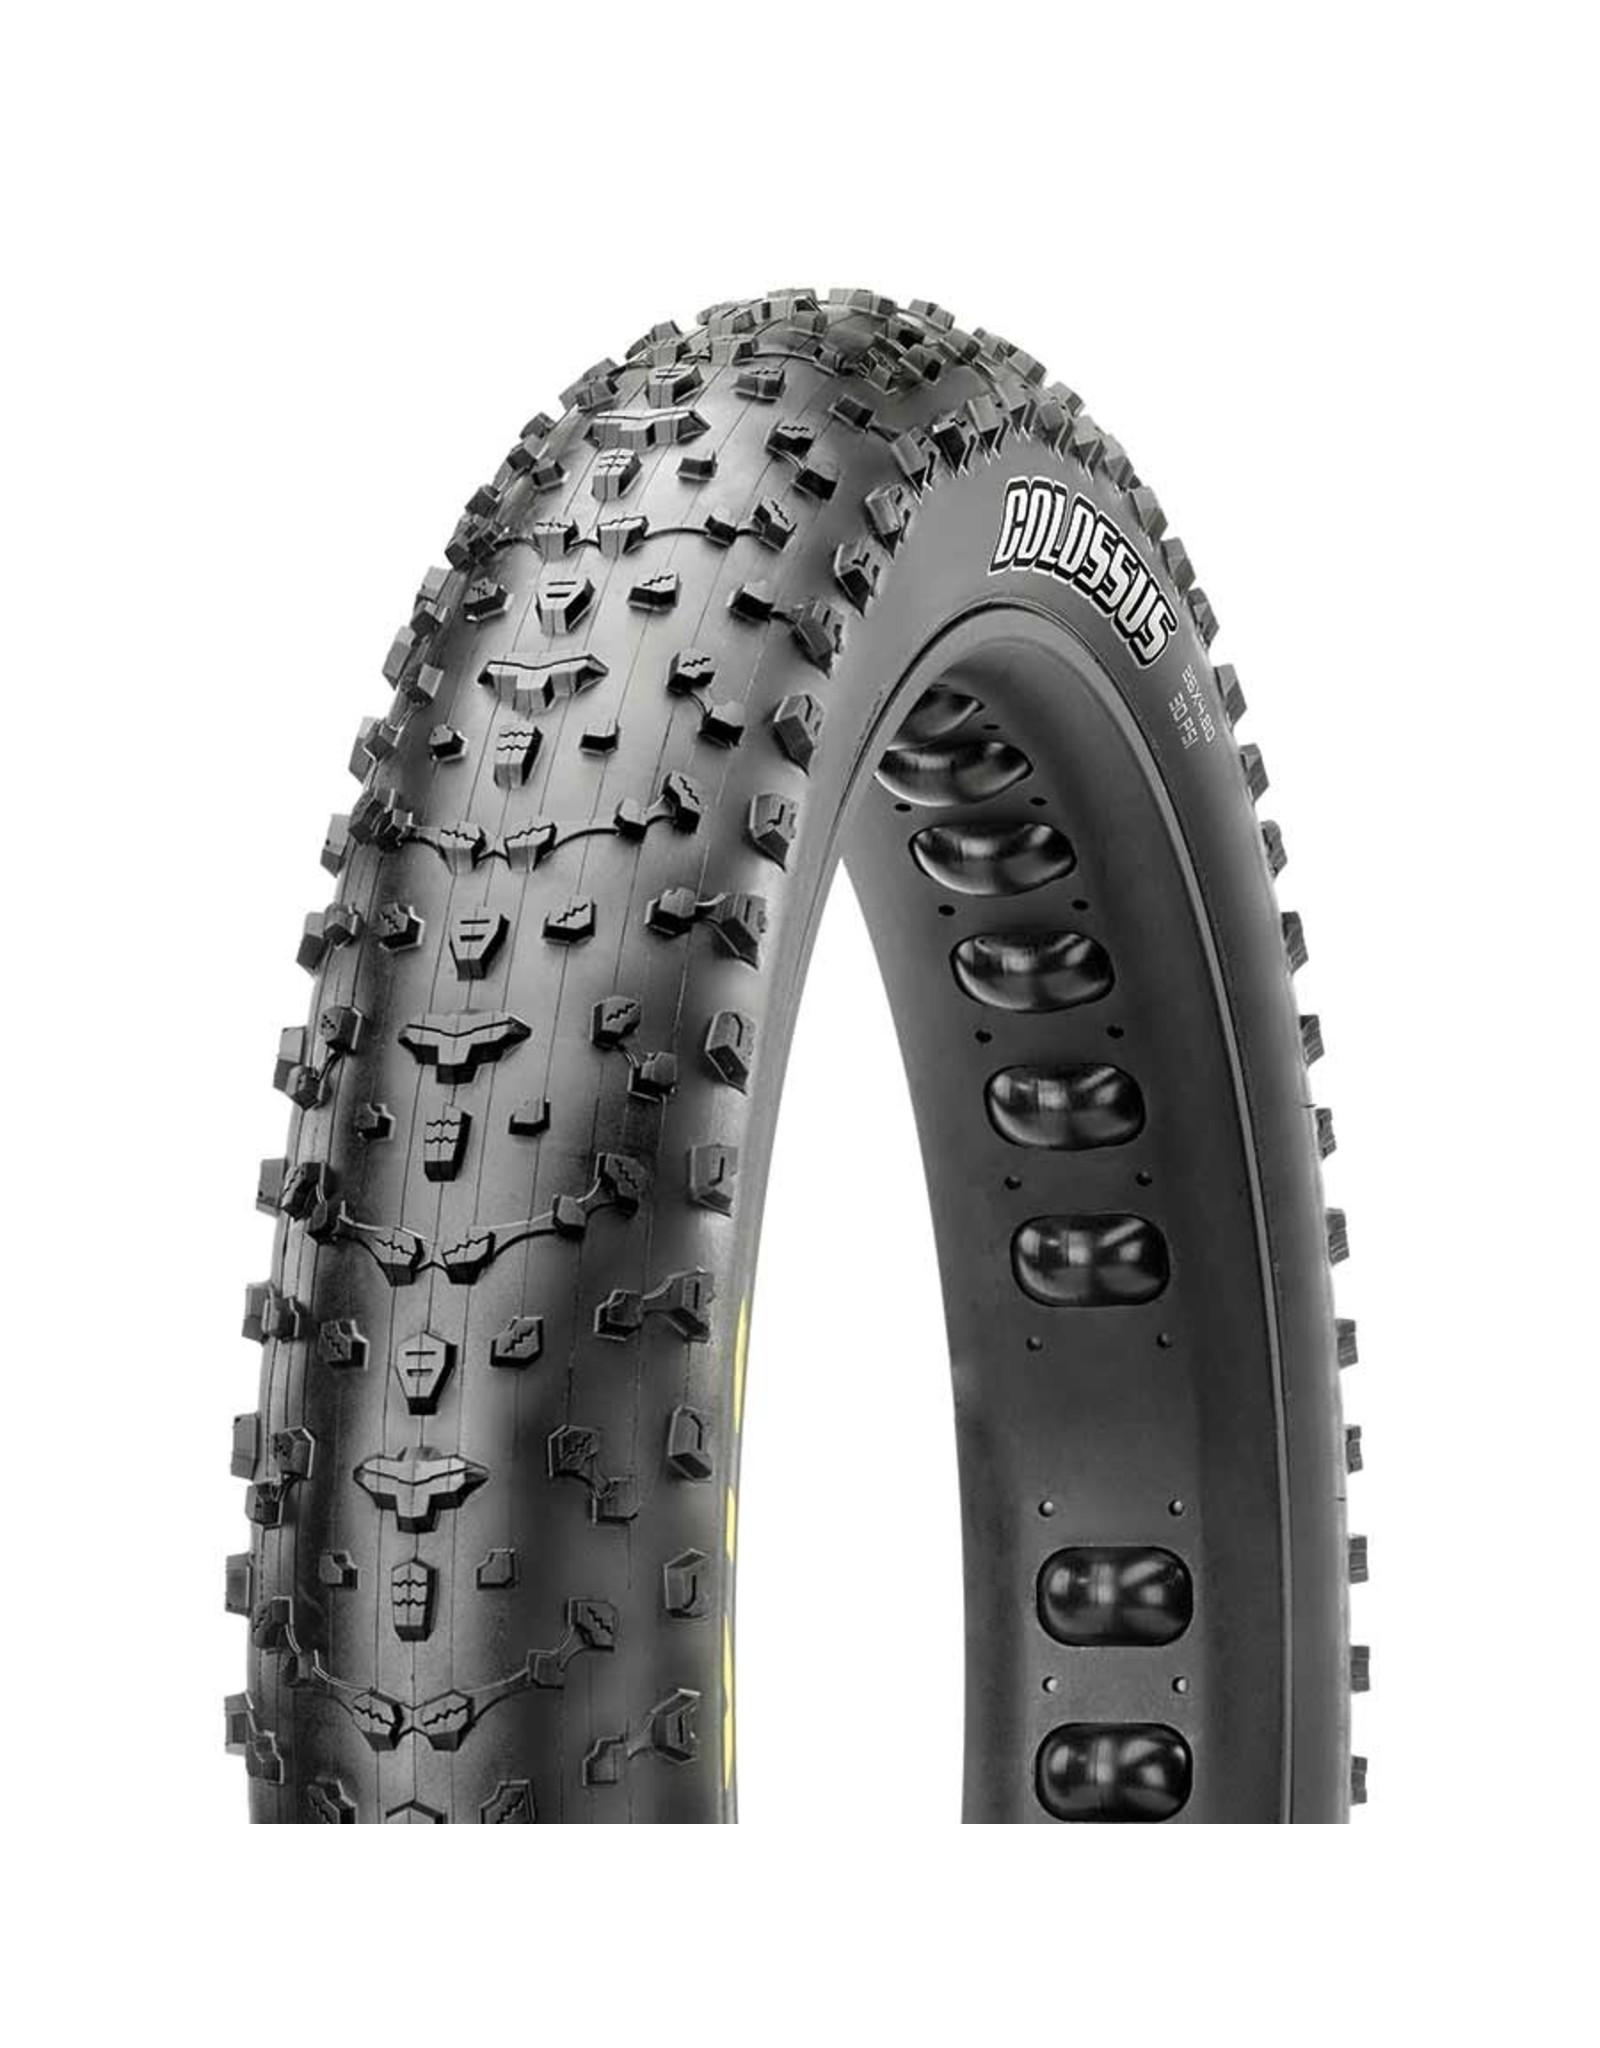 Maxxis, Colossus, Tire, 27.5''x4.50, Folding, Tubeless Ready, Dual, EXO, 120TPI, Black